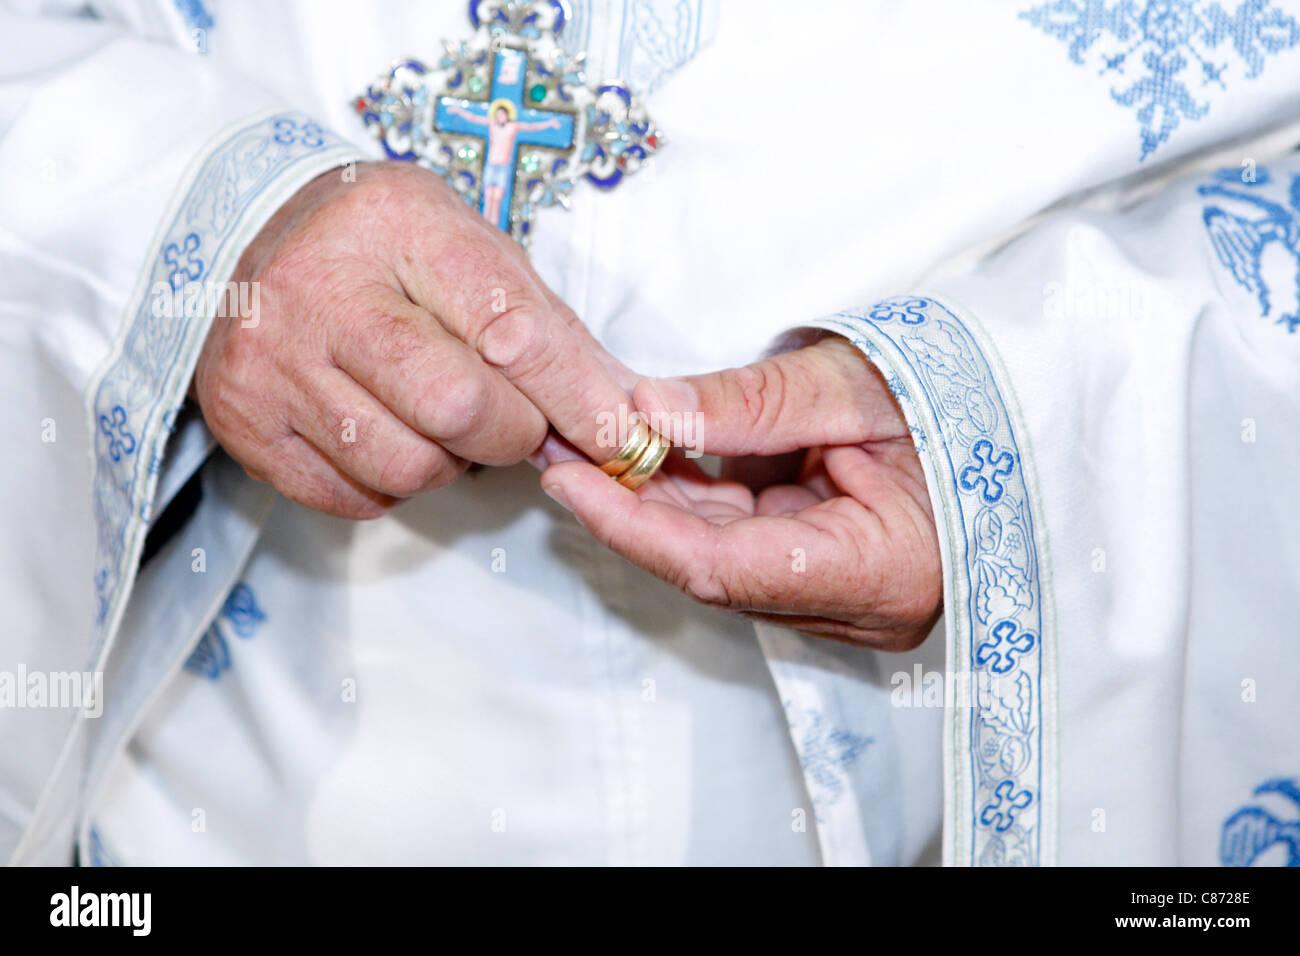 Priest Wedding Rings Stock Photos & Priest Wedding Rings Stock ...